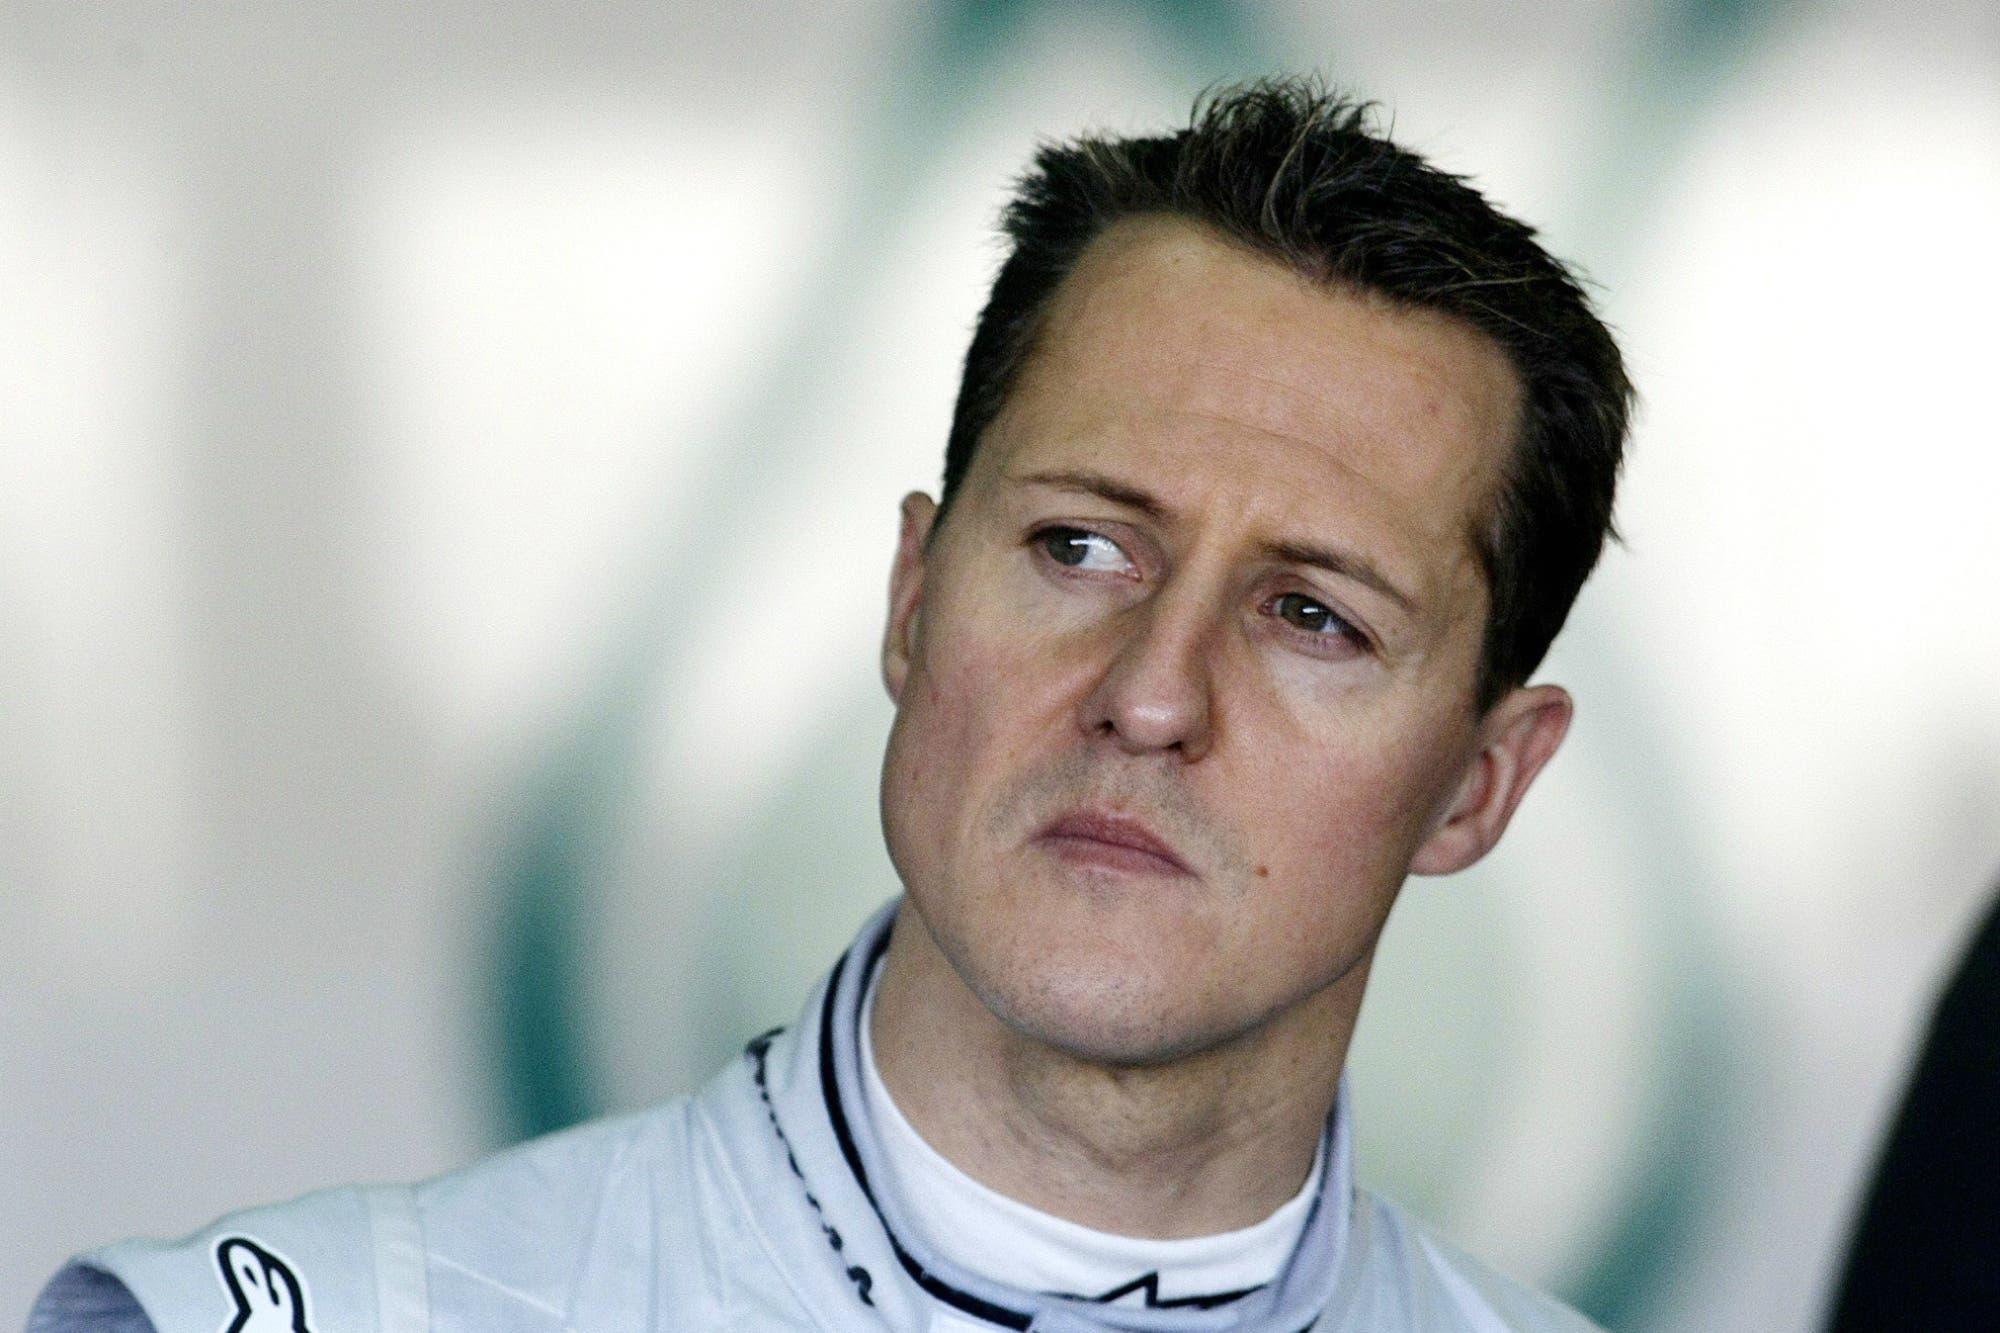 La salud de Michael Schumacher: trasladan a París al séptuple campeón de la F.1